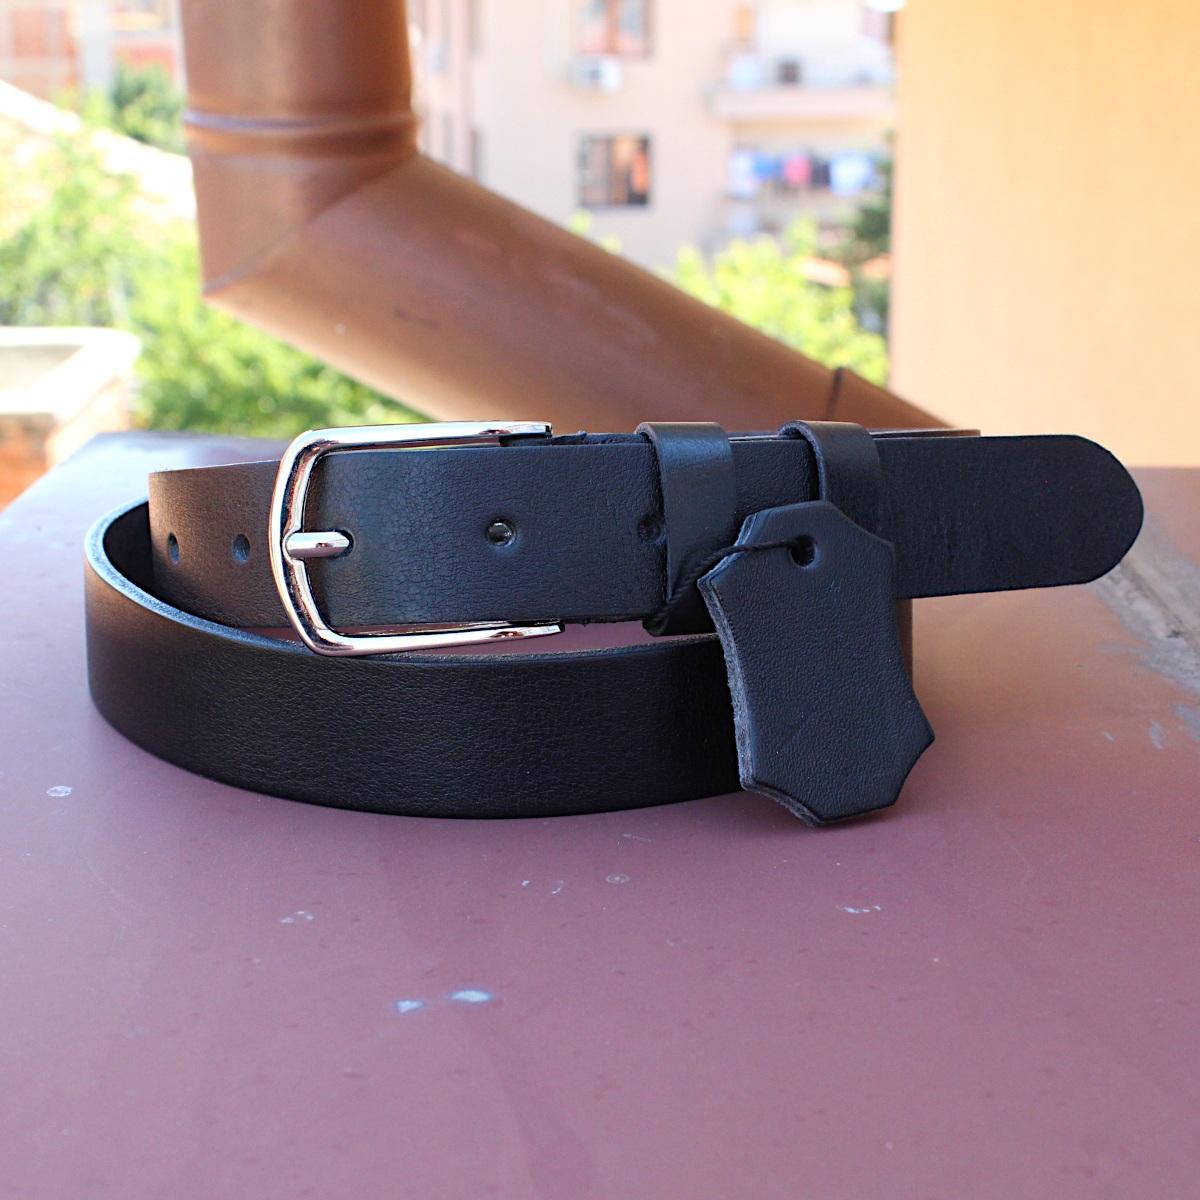 стилен черен дамски колан естествена кожа 8266 цветна